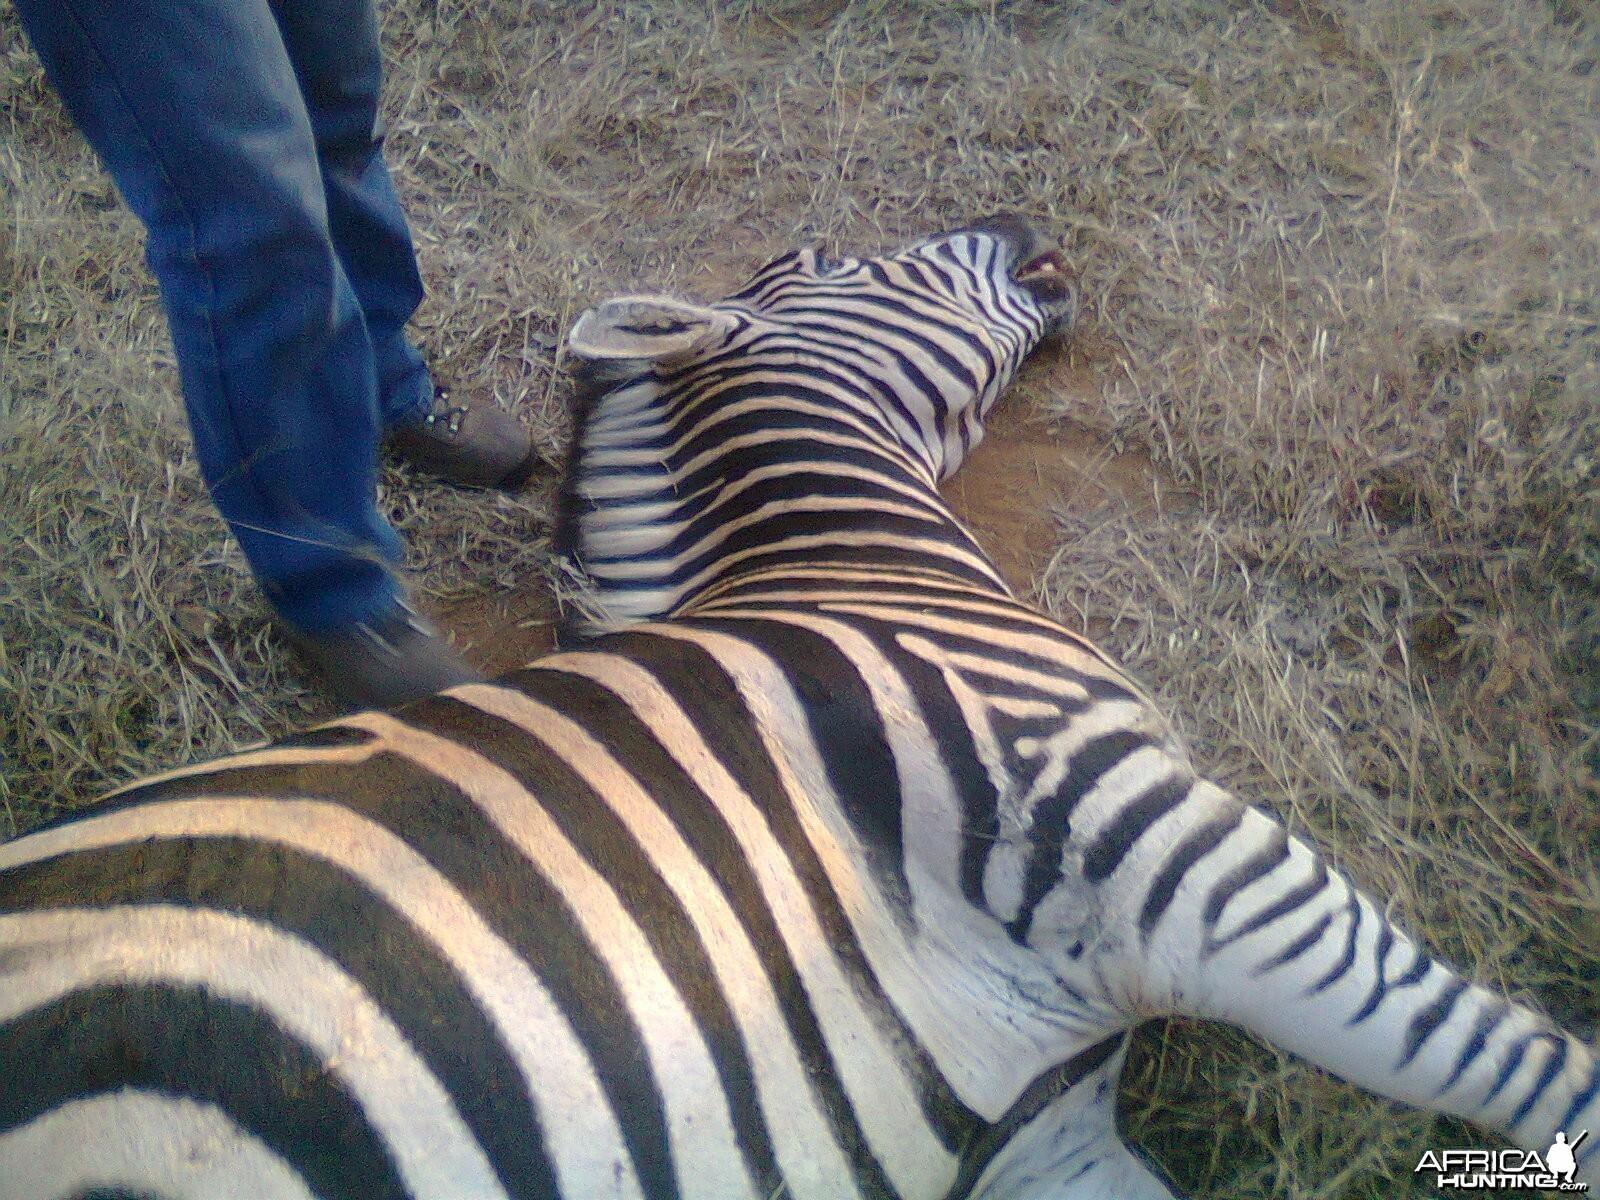 Radolfo's zebra